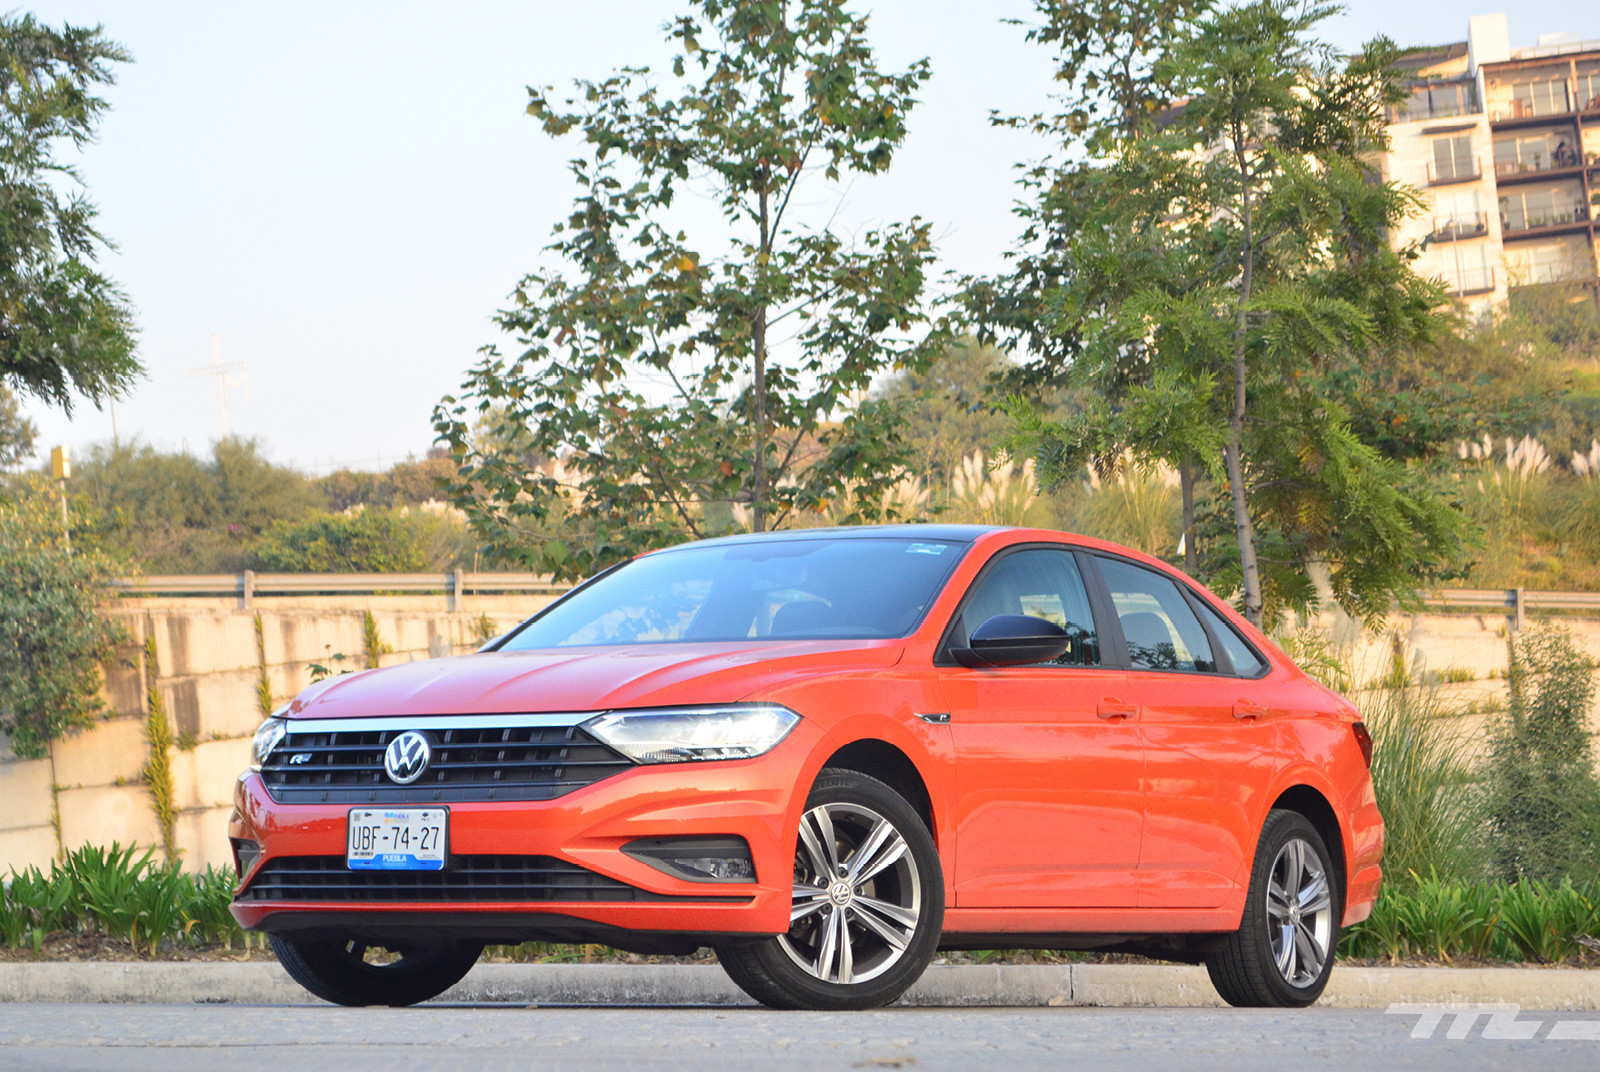 Foto de Comparativa: Mazda 3 2018 vs. KIA Forte vs. Volkswagen Jetta (6/31)